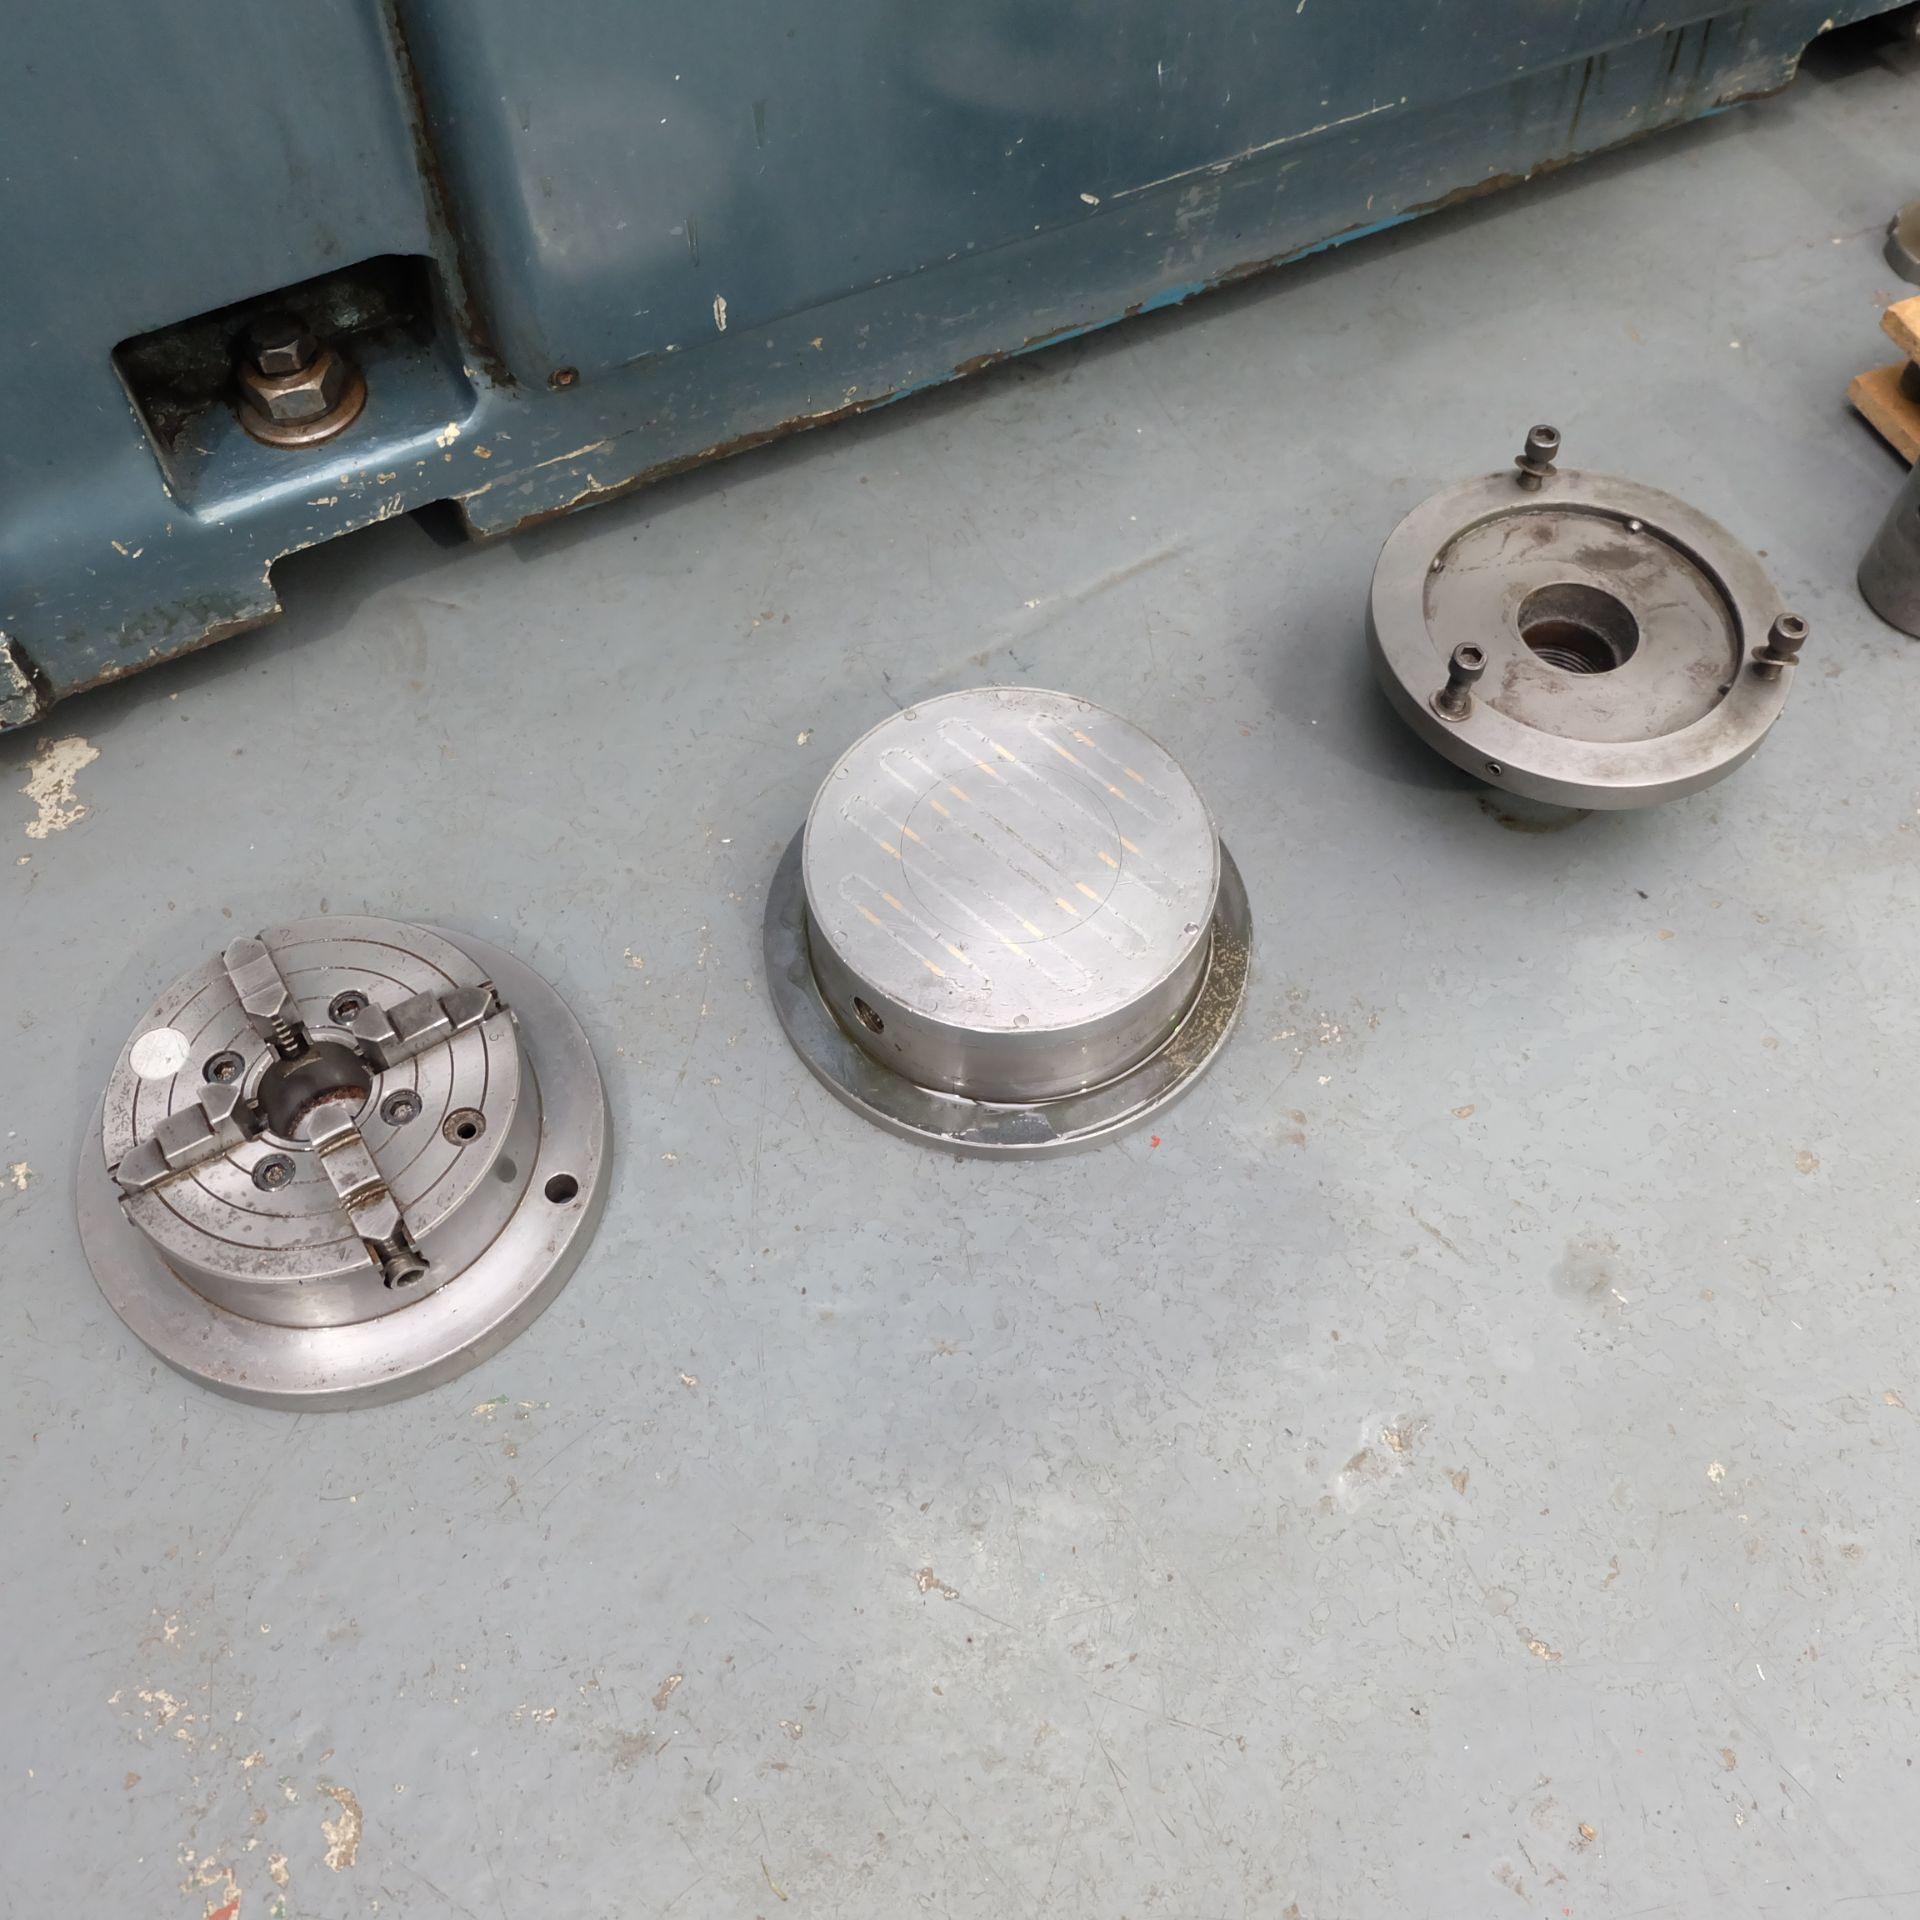 "Jones & Shipman Type 1311 Universal Cylindrical Grinder. 24"" x 10"" Capacity. - Image 9 of 11"